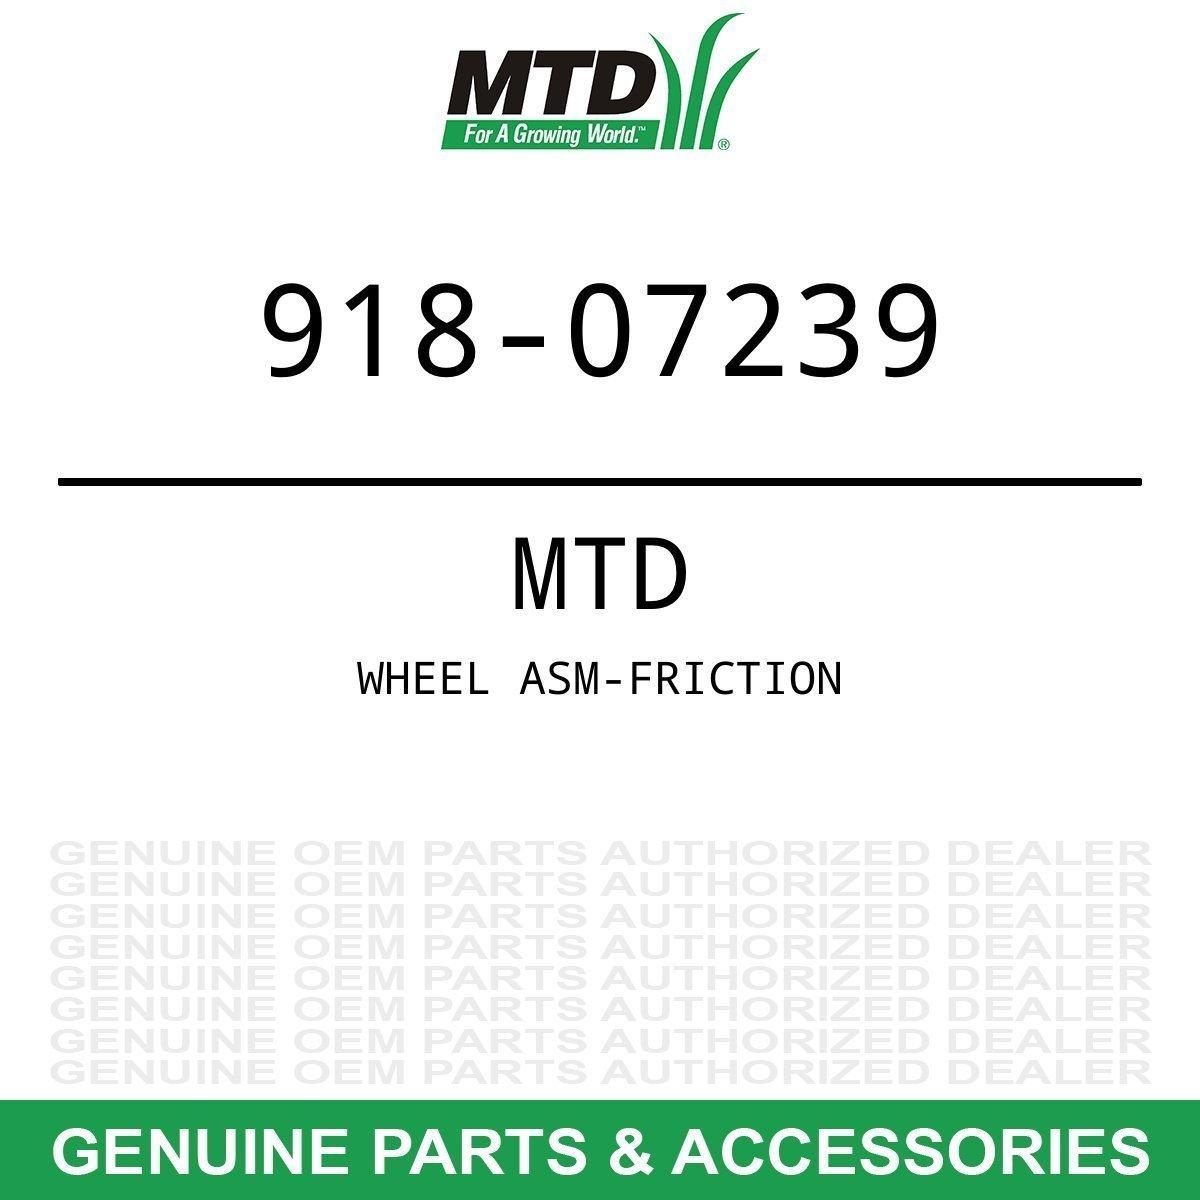 Genuine MTD WHEEL ASM-FRICTION Part#  918-07239